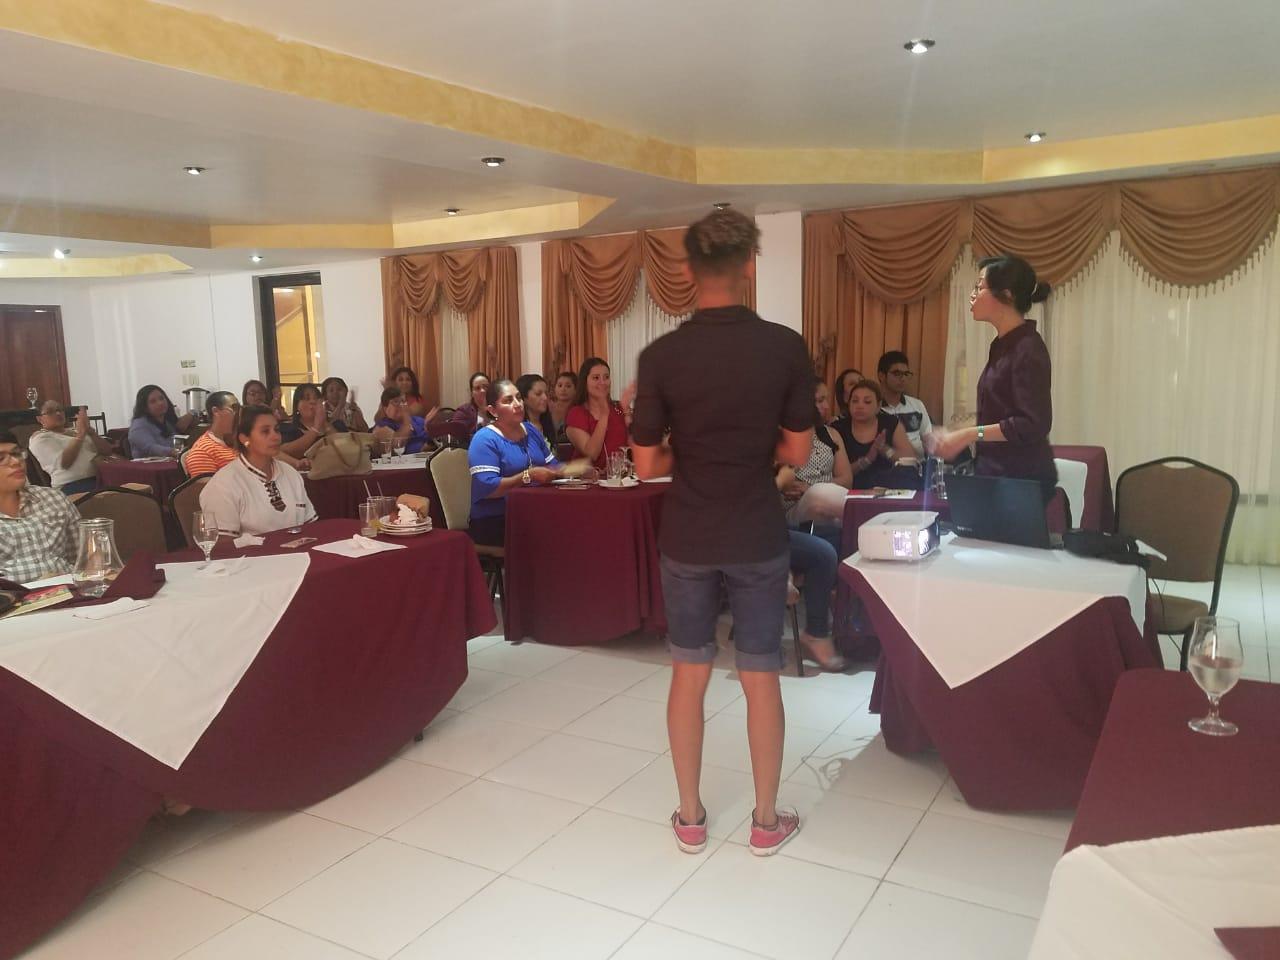 AJD capacitó a personal de justicia de la ciudad de La Ceiba